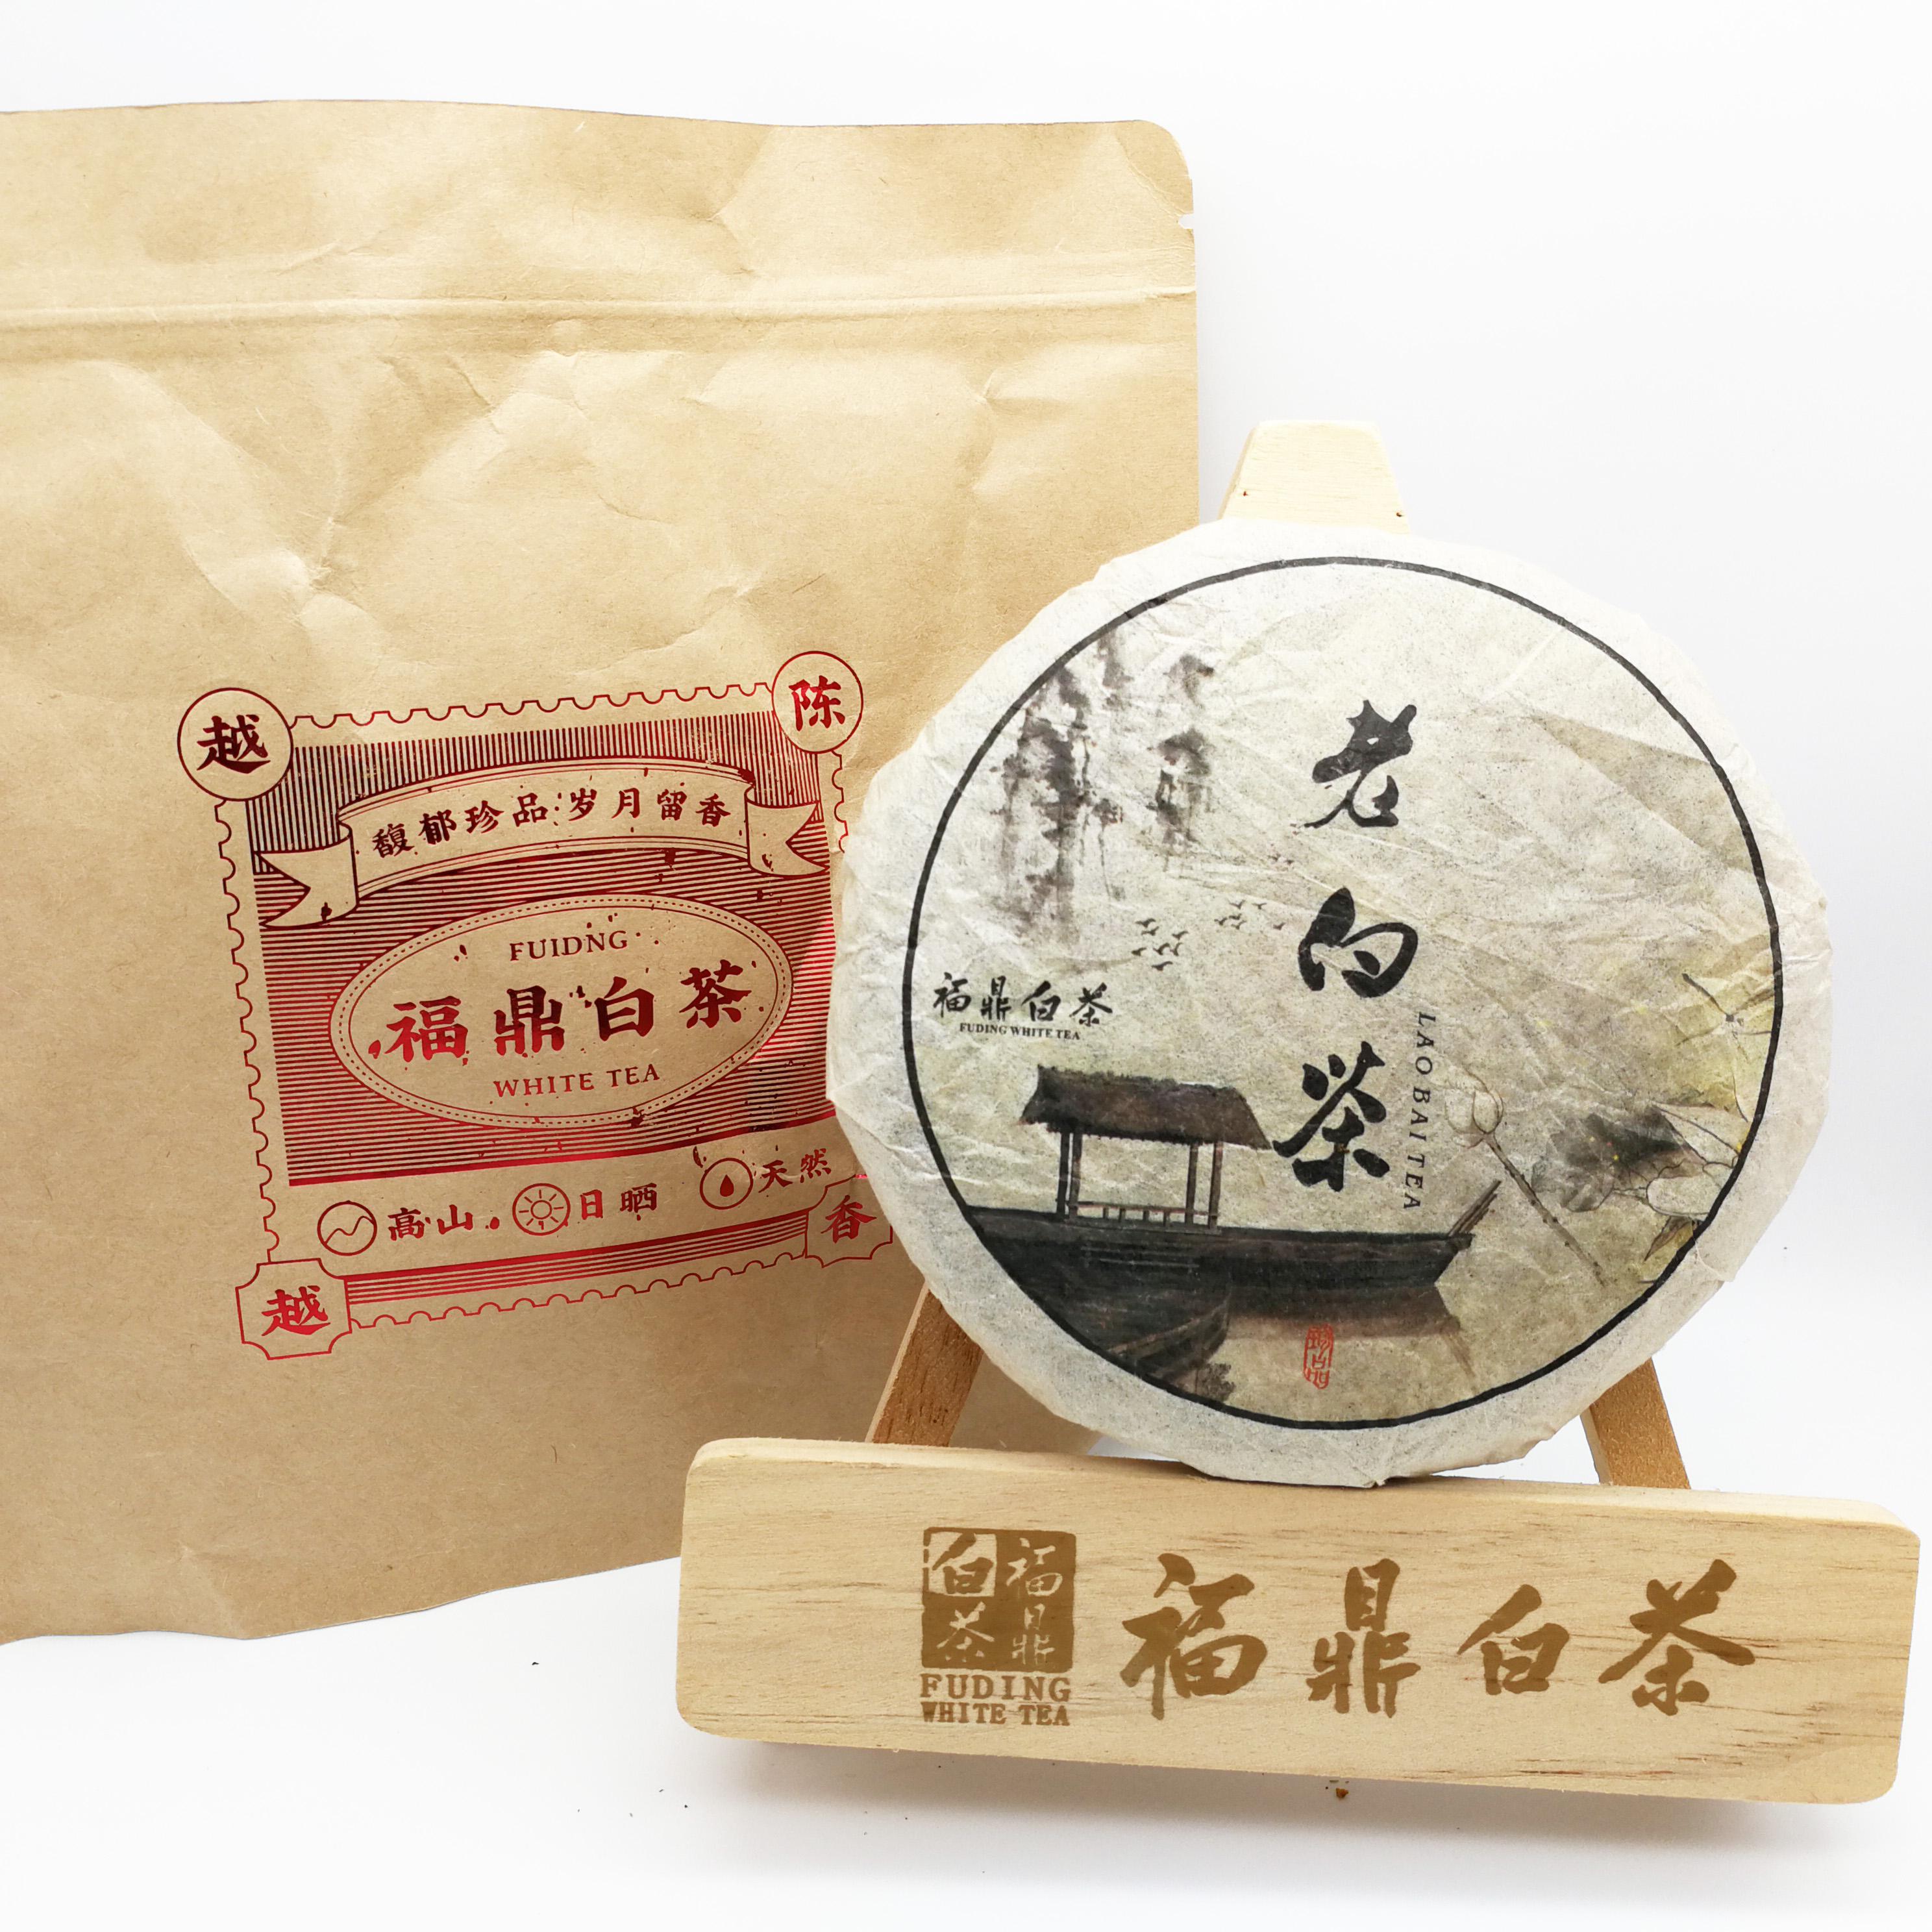 Most Popular Customized Packaging Tuocha 100grams Fuding White Tea baicha bing Gongmei white Tea - 4uTea | 4uTea.com